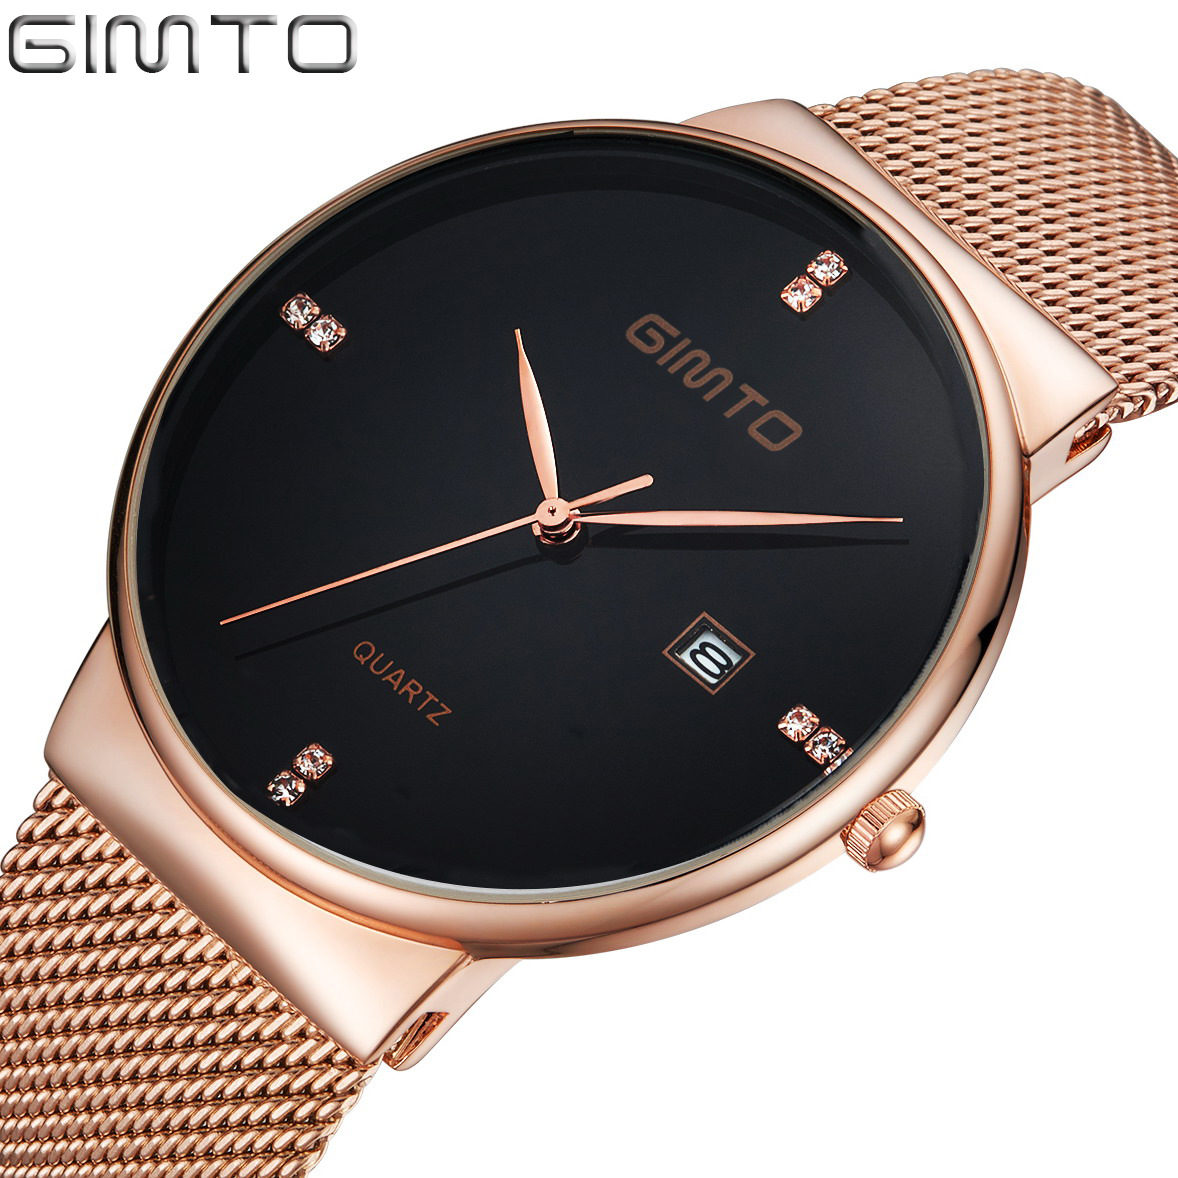 Gimto 2018 Hot Luxury Quartz Watches Men New Gold Black Stainless Steel Hand Watch Waterproof Business Relogio Montre Wristwatch цена и фото